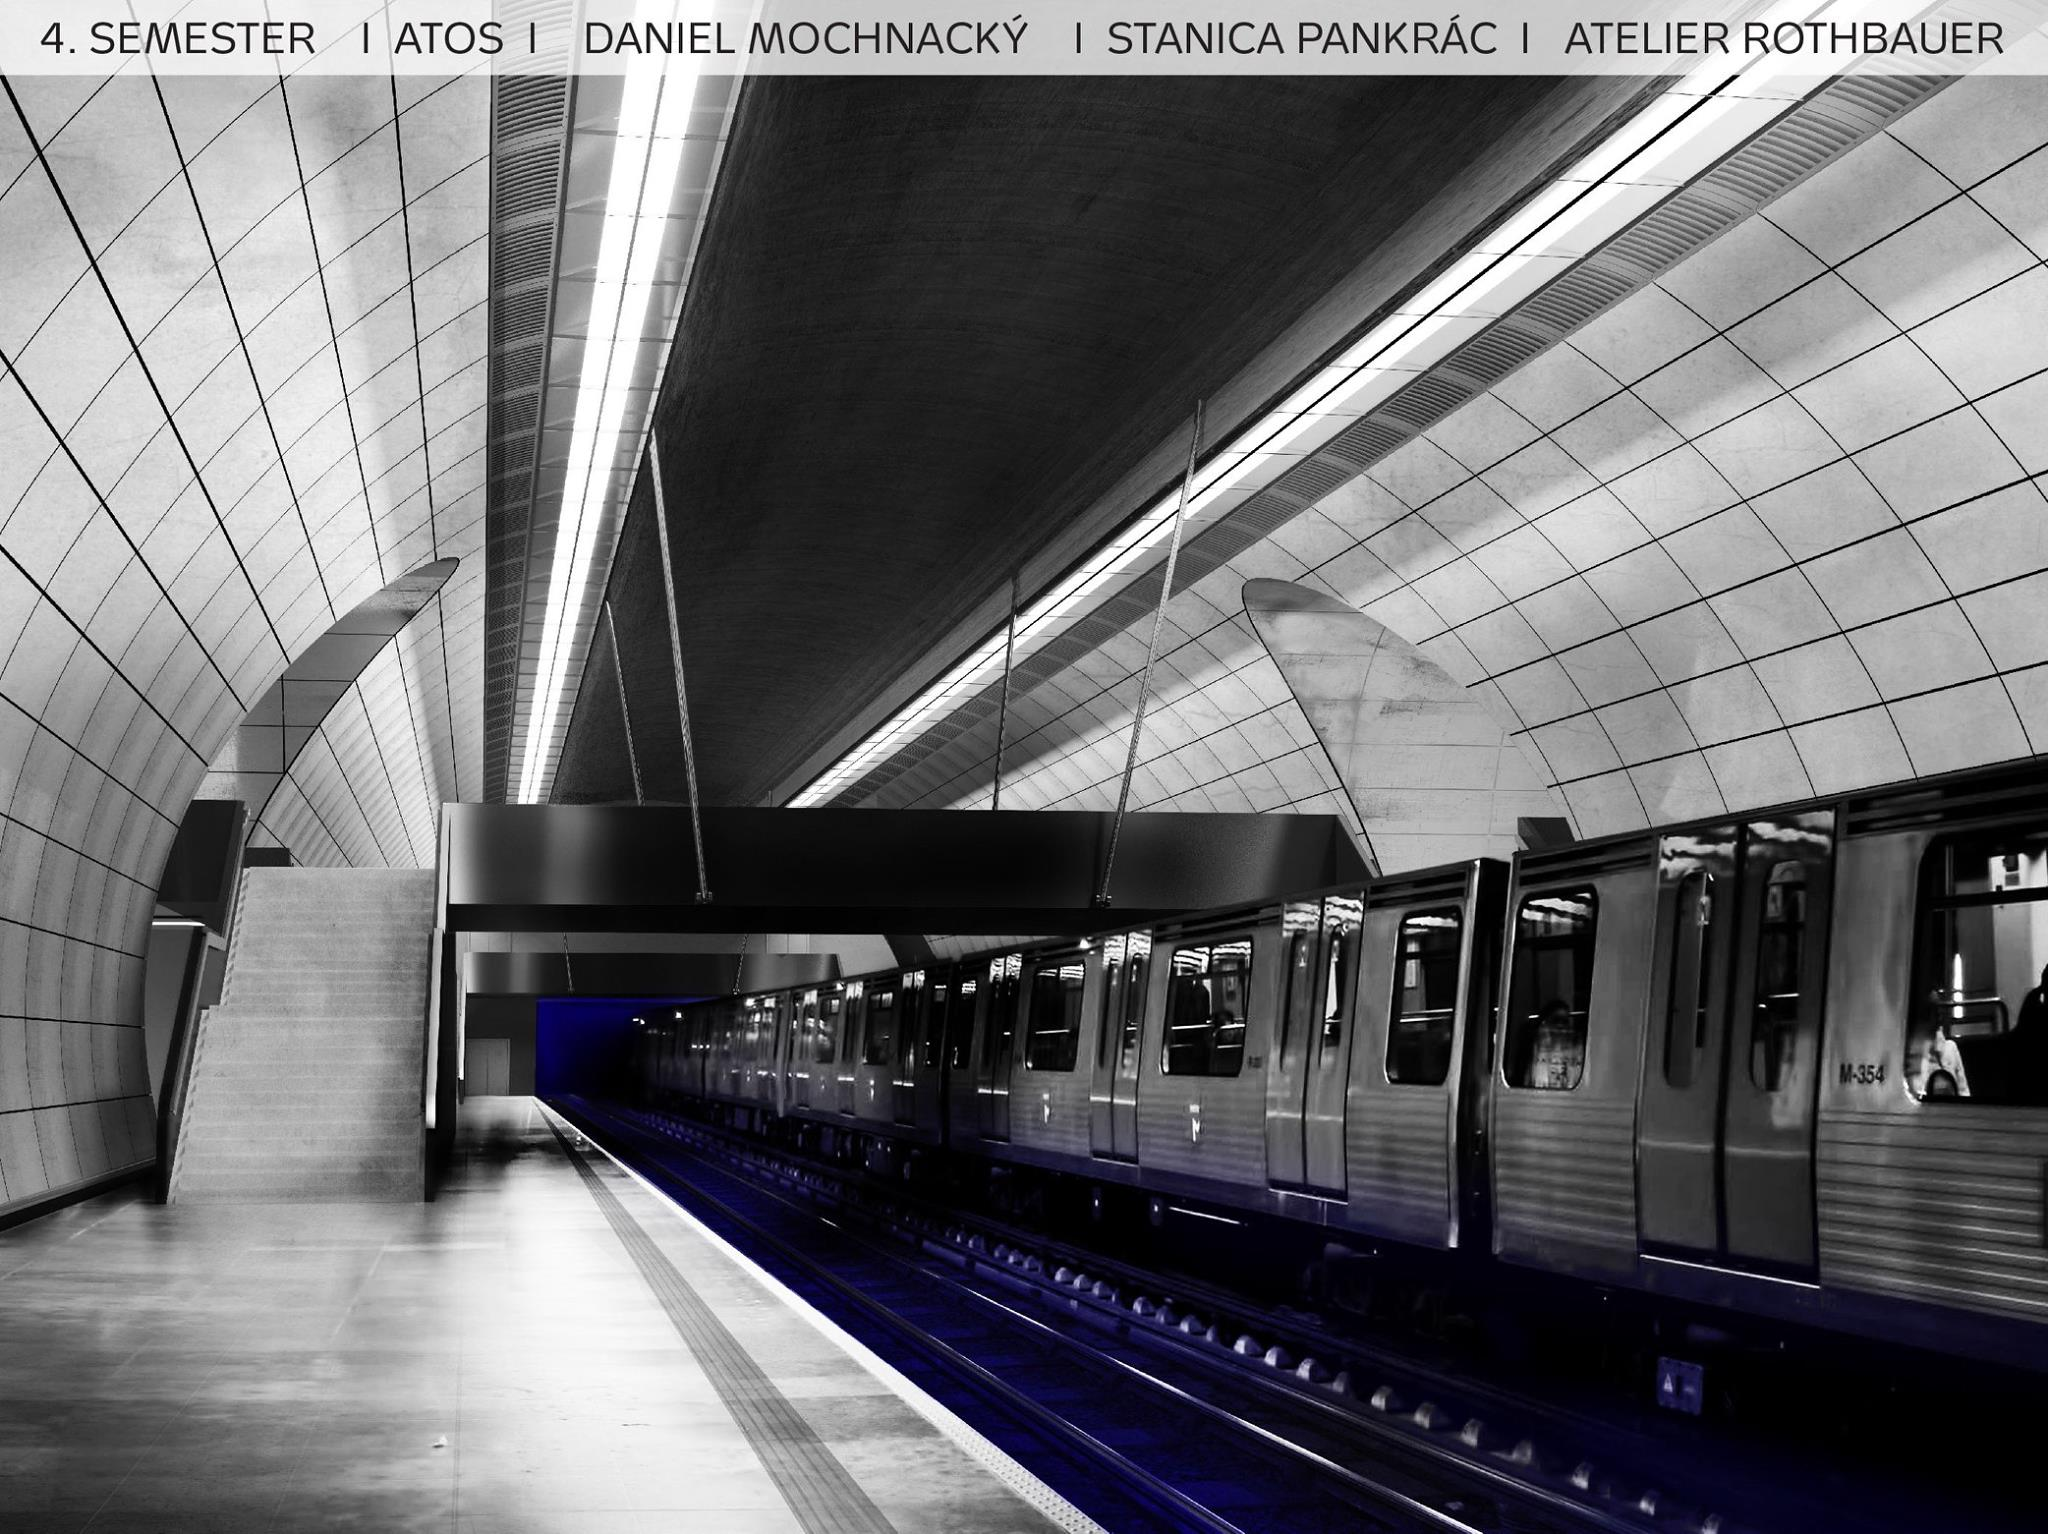 Pankrác | Image: Daniel Mochnacký (via Facebook / Metro D atelier Rothbauer)